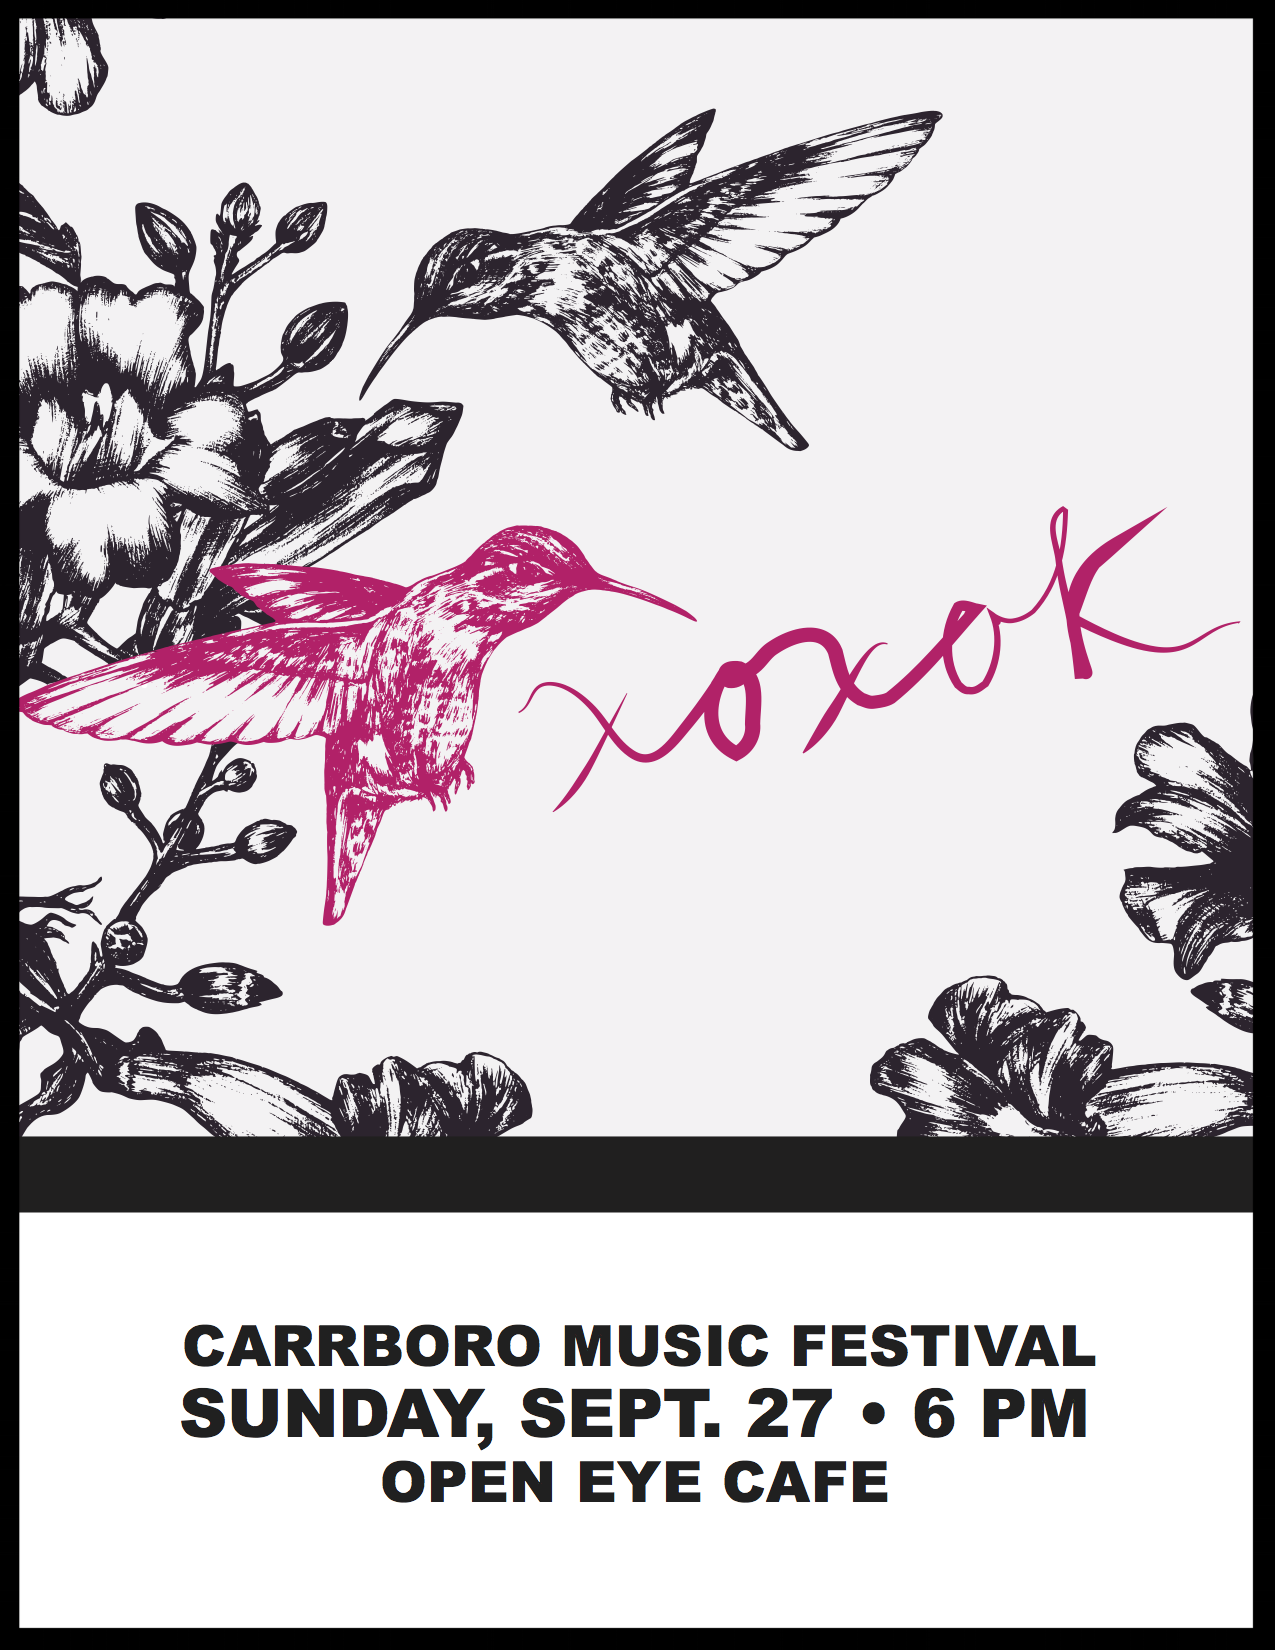 carrboro music fest_hummingbird (2).png